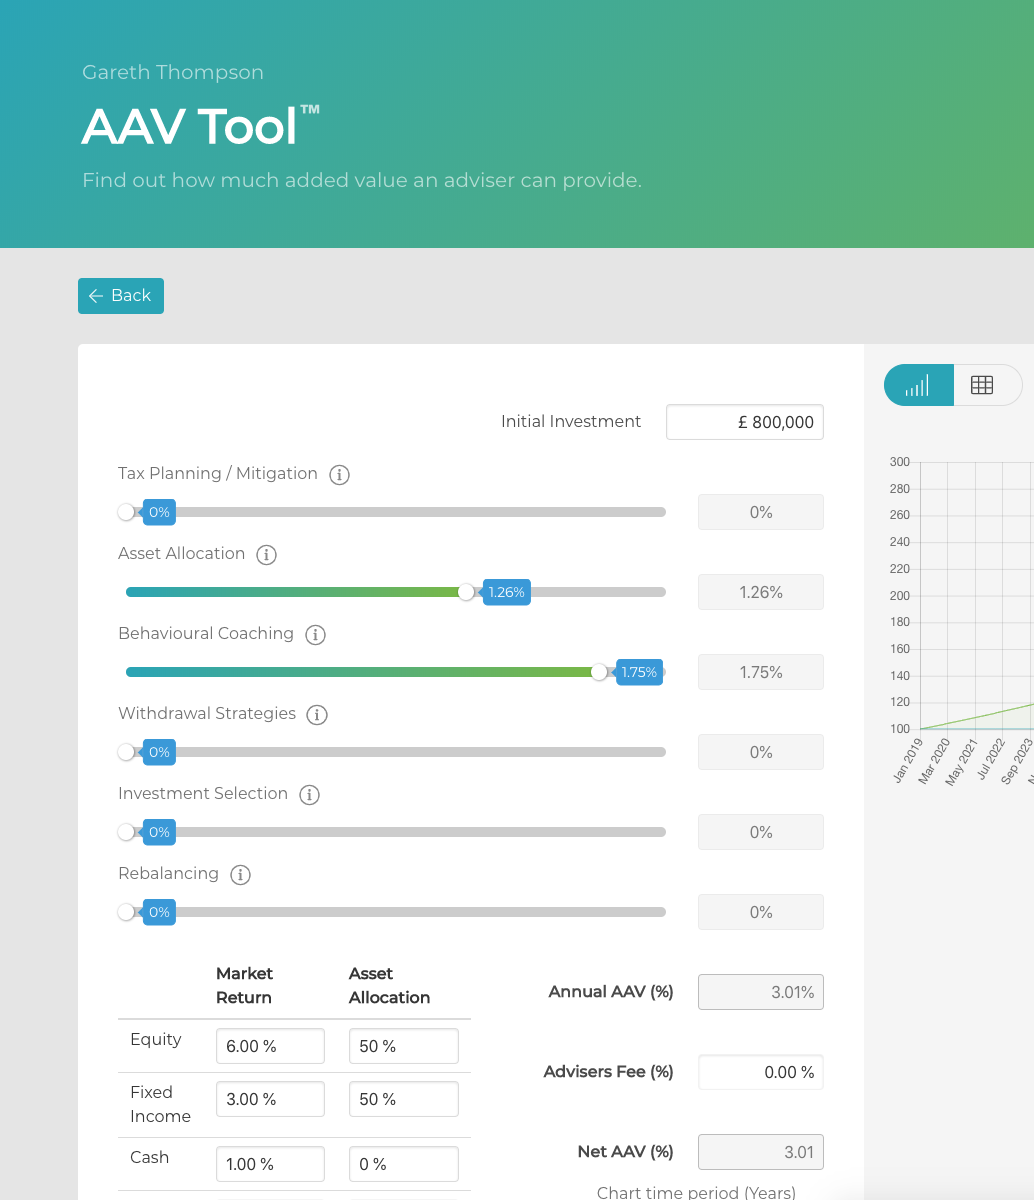 The AAV Tool